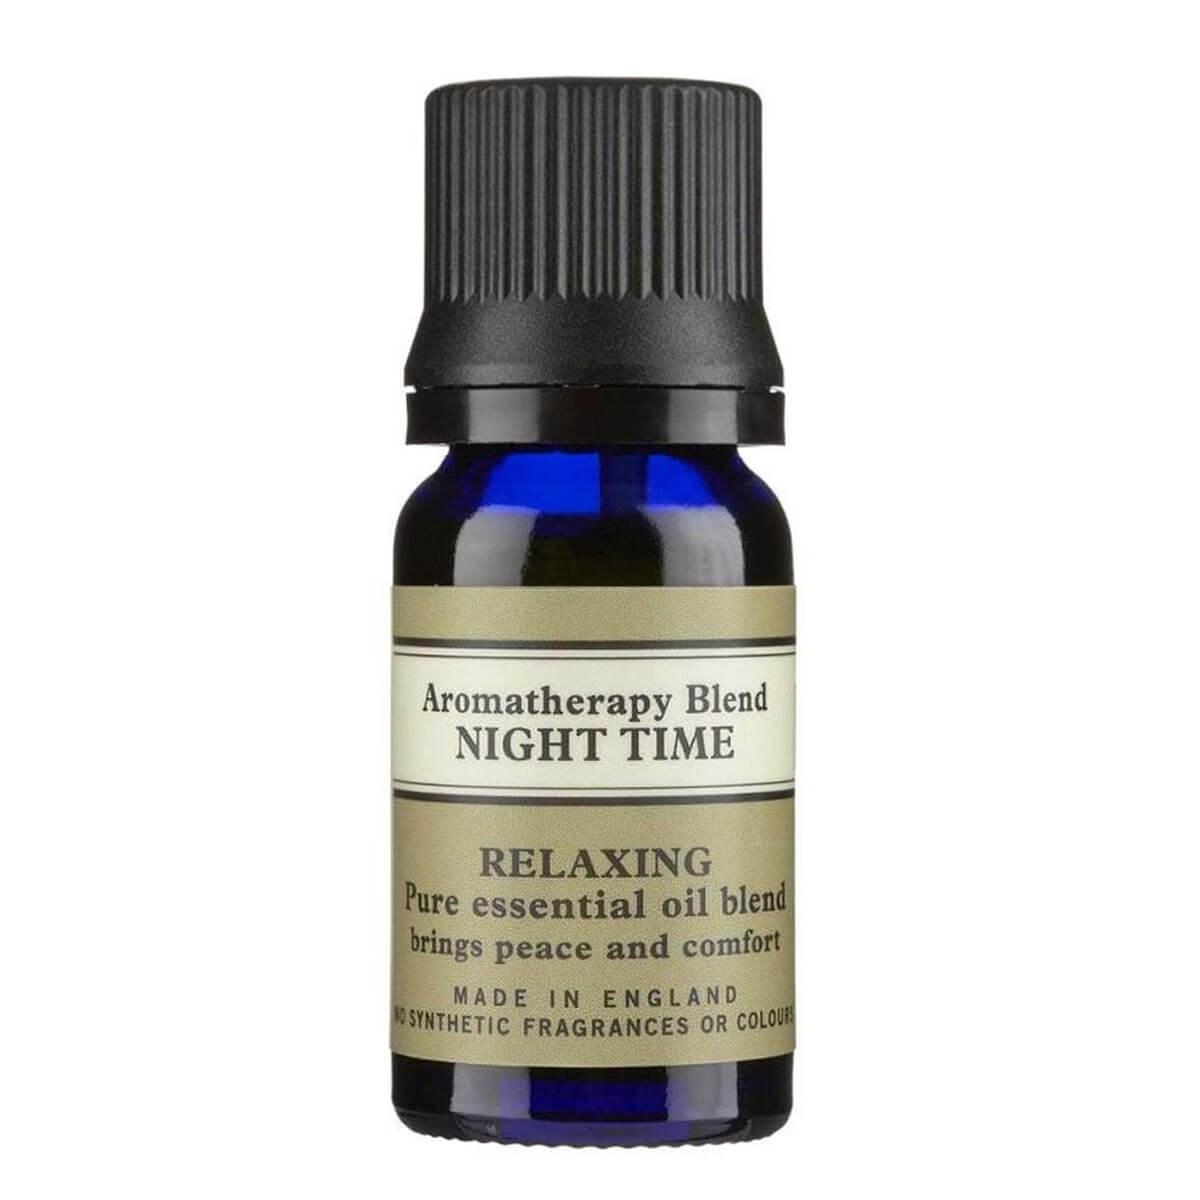 Neal's Yard Remedies Aromatherapy Blend - Night Time